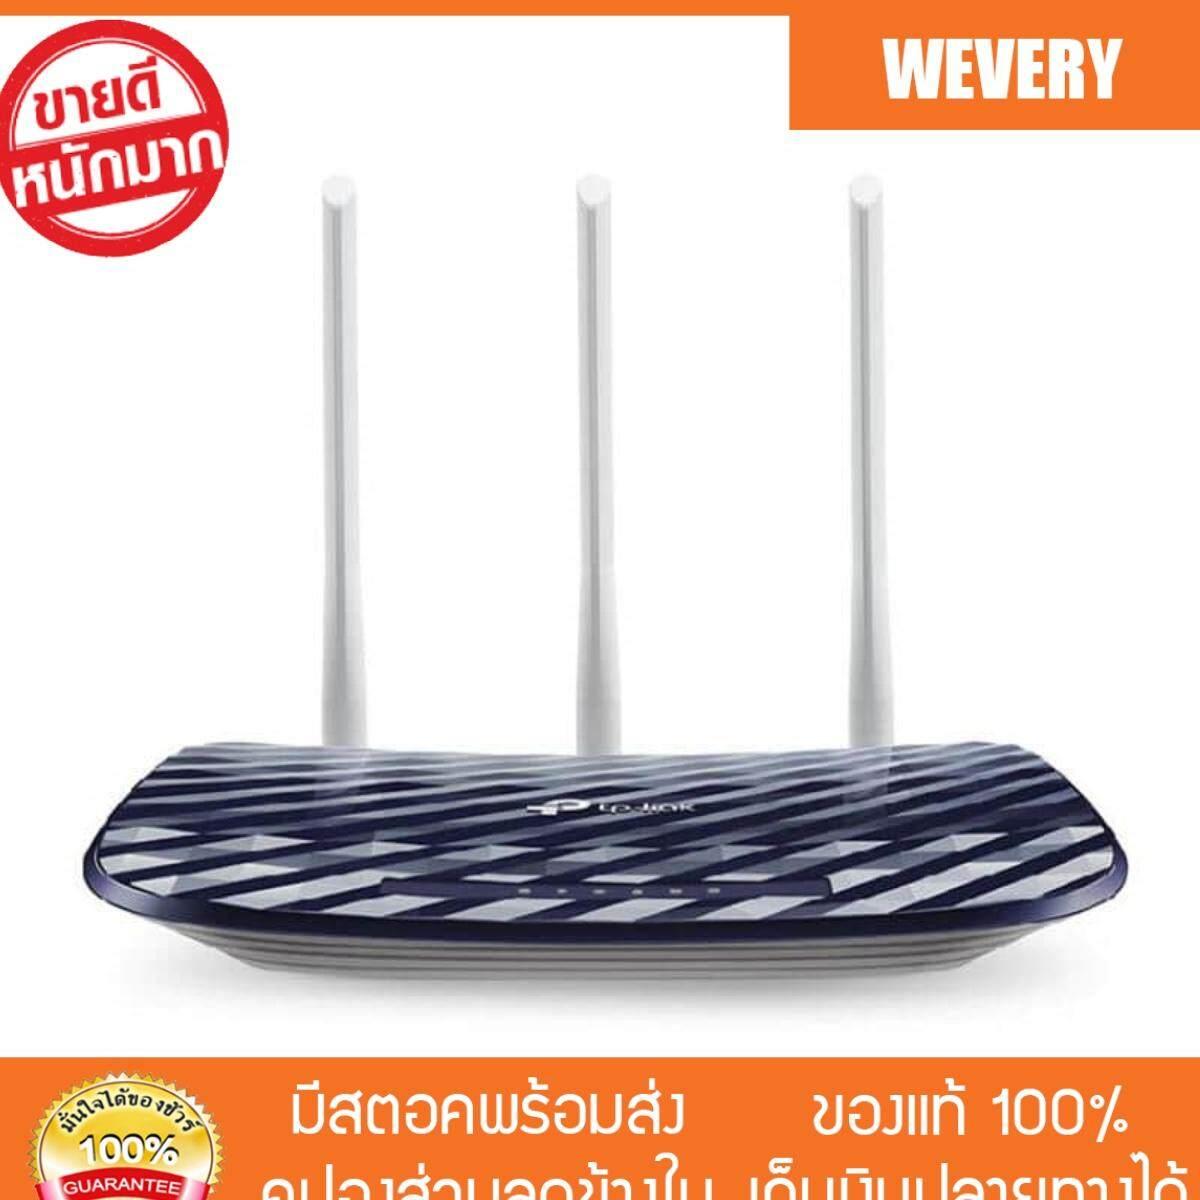 [Wevery] TP-LINK Archer C20 Wi-Fi เราเตอร์ (AC750 Wireless Dual Band Router) ปล่อย Wi-Fi FTTx เร้าเตอร์ไวไฟ ส่ง Kerry เก็บปลายทางได้